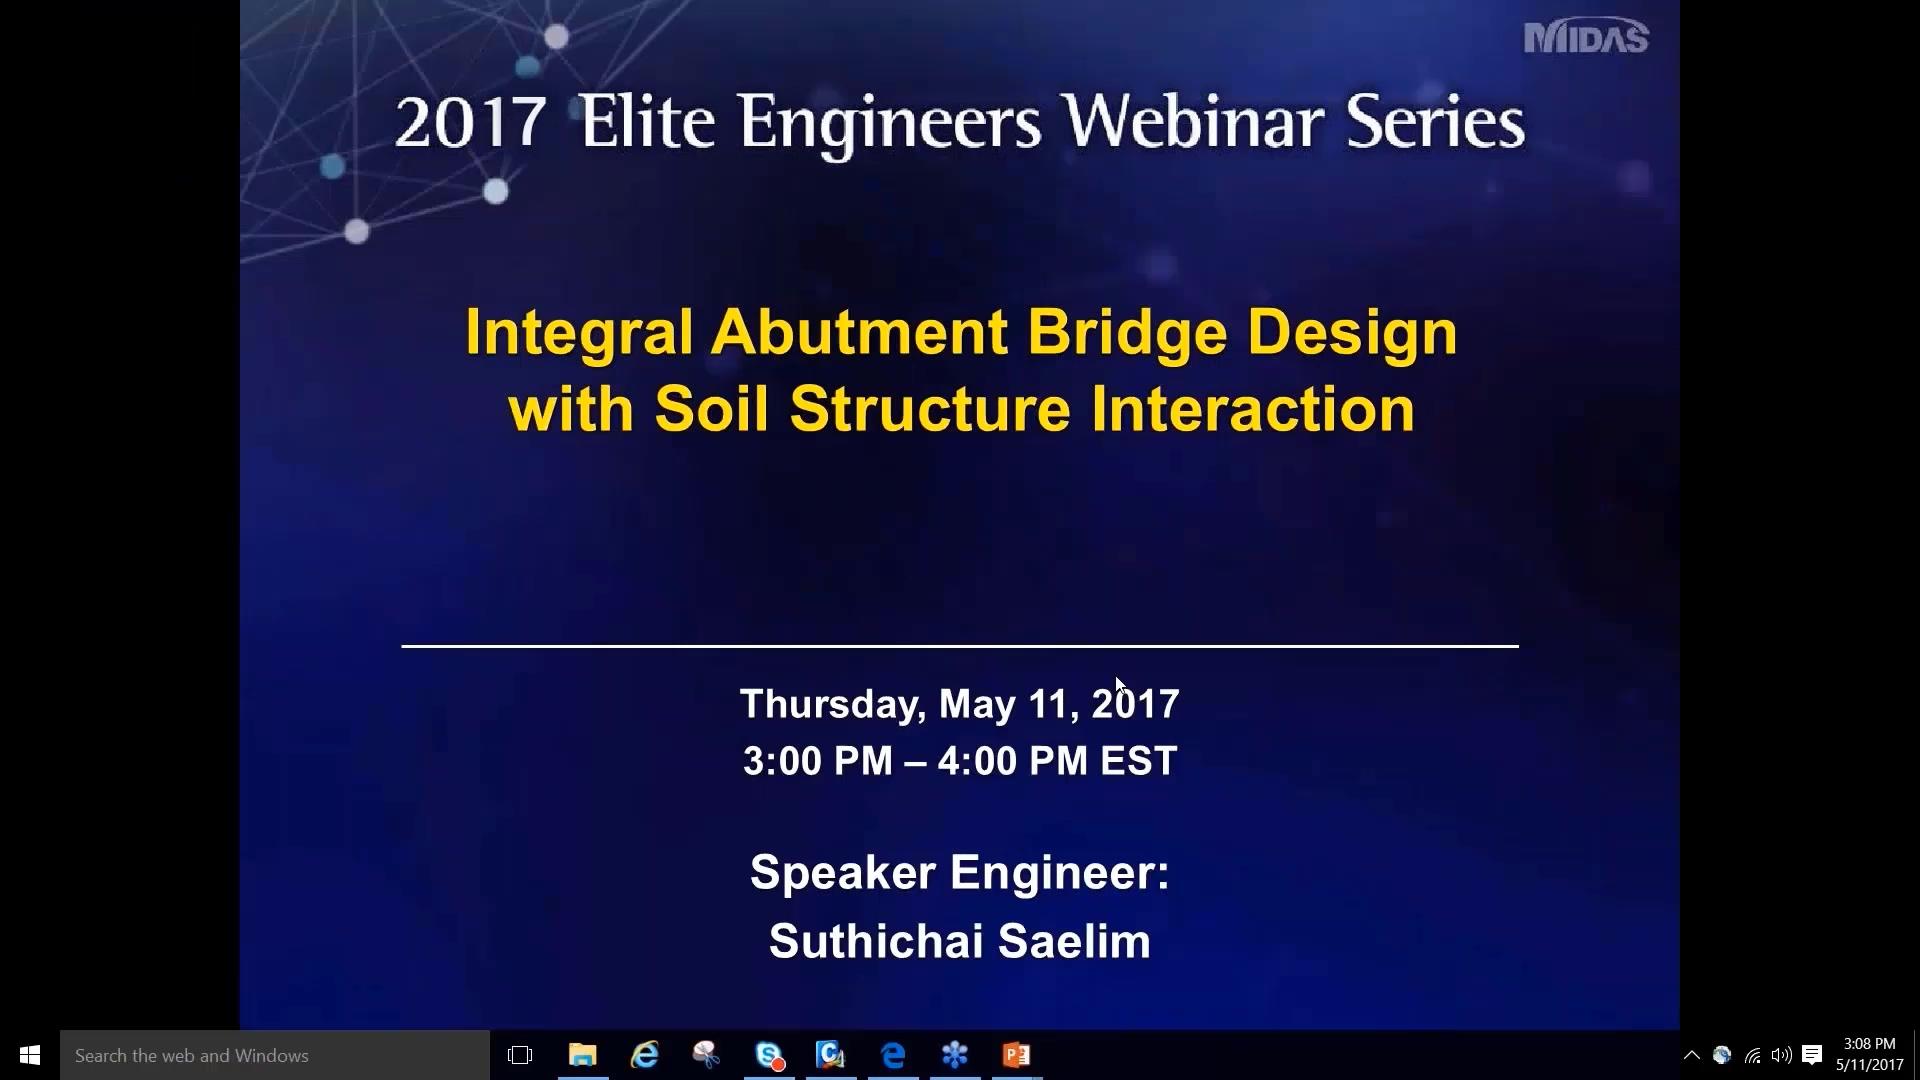 Intergral Autment Bridge Design with Soil Structure Interaction